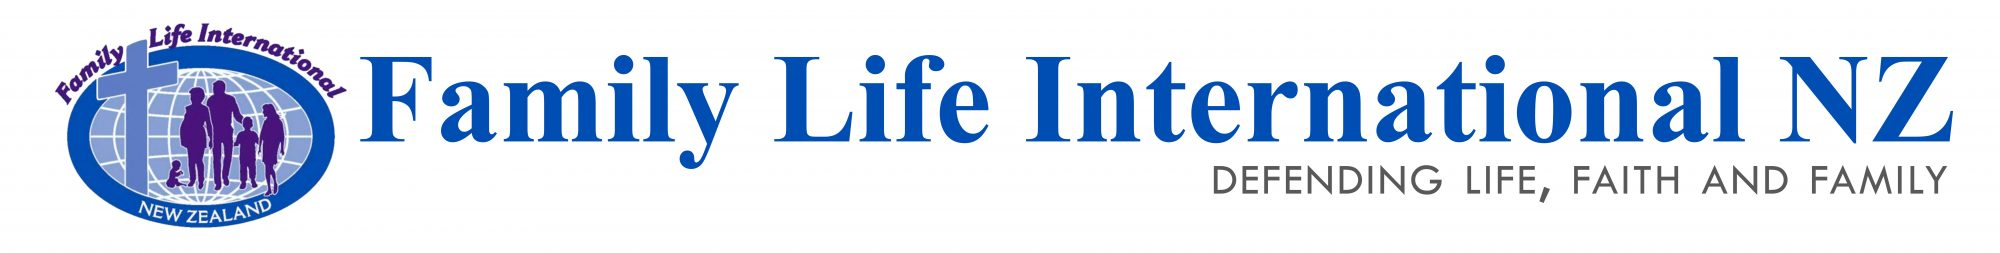 Family Life International NZ